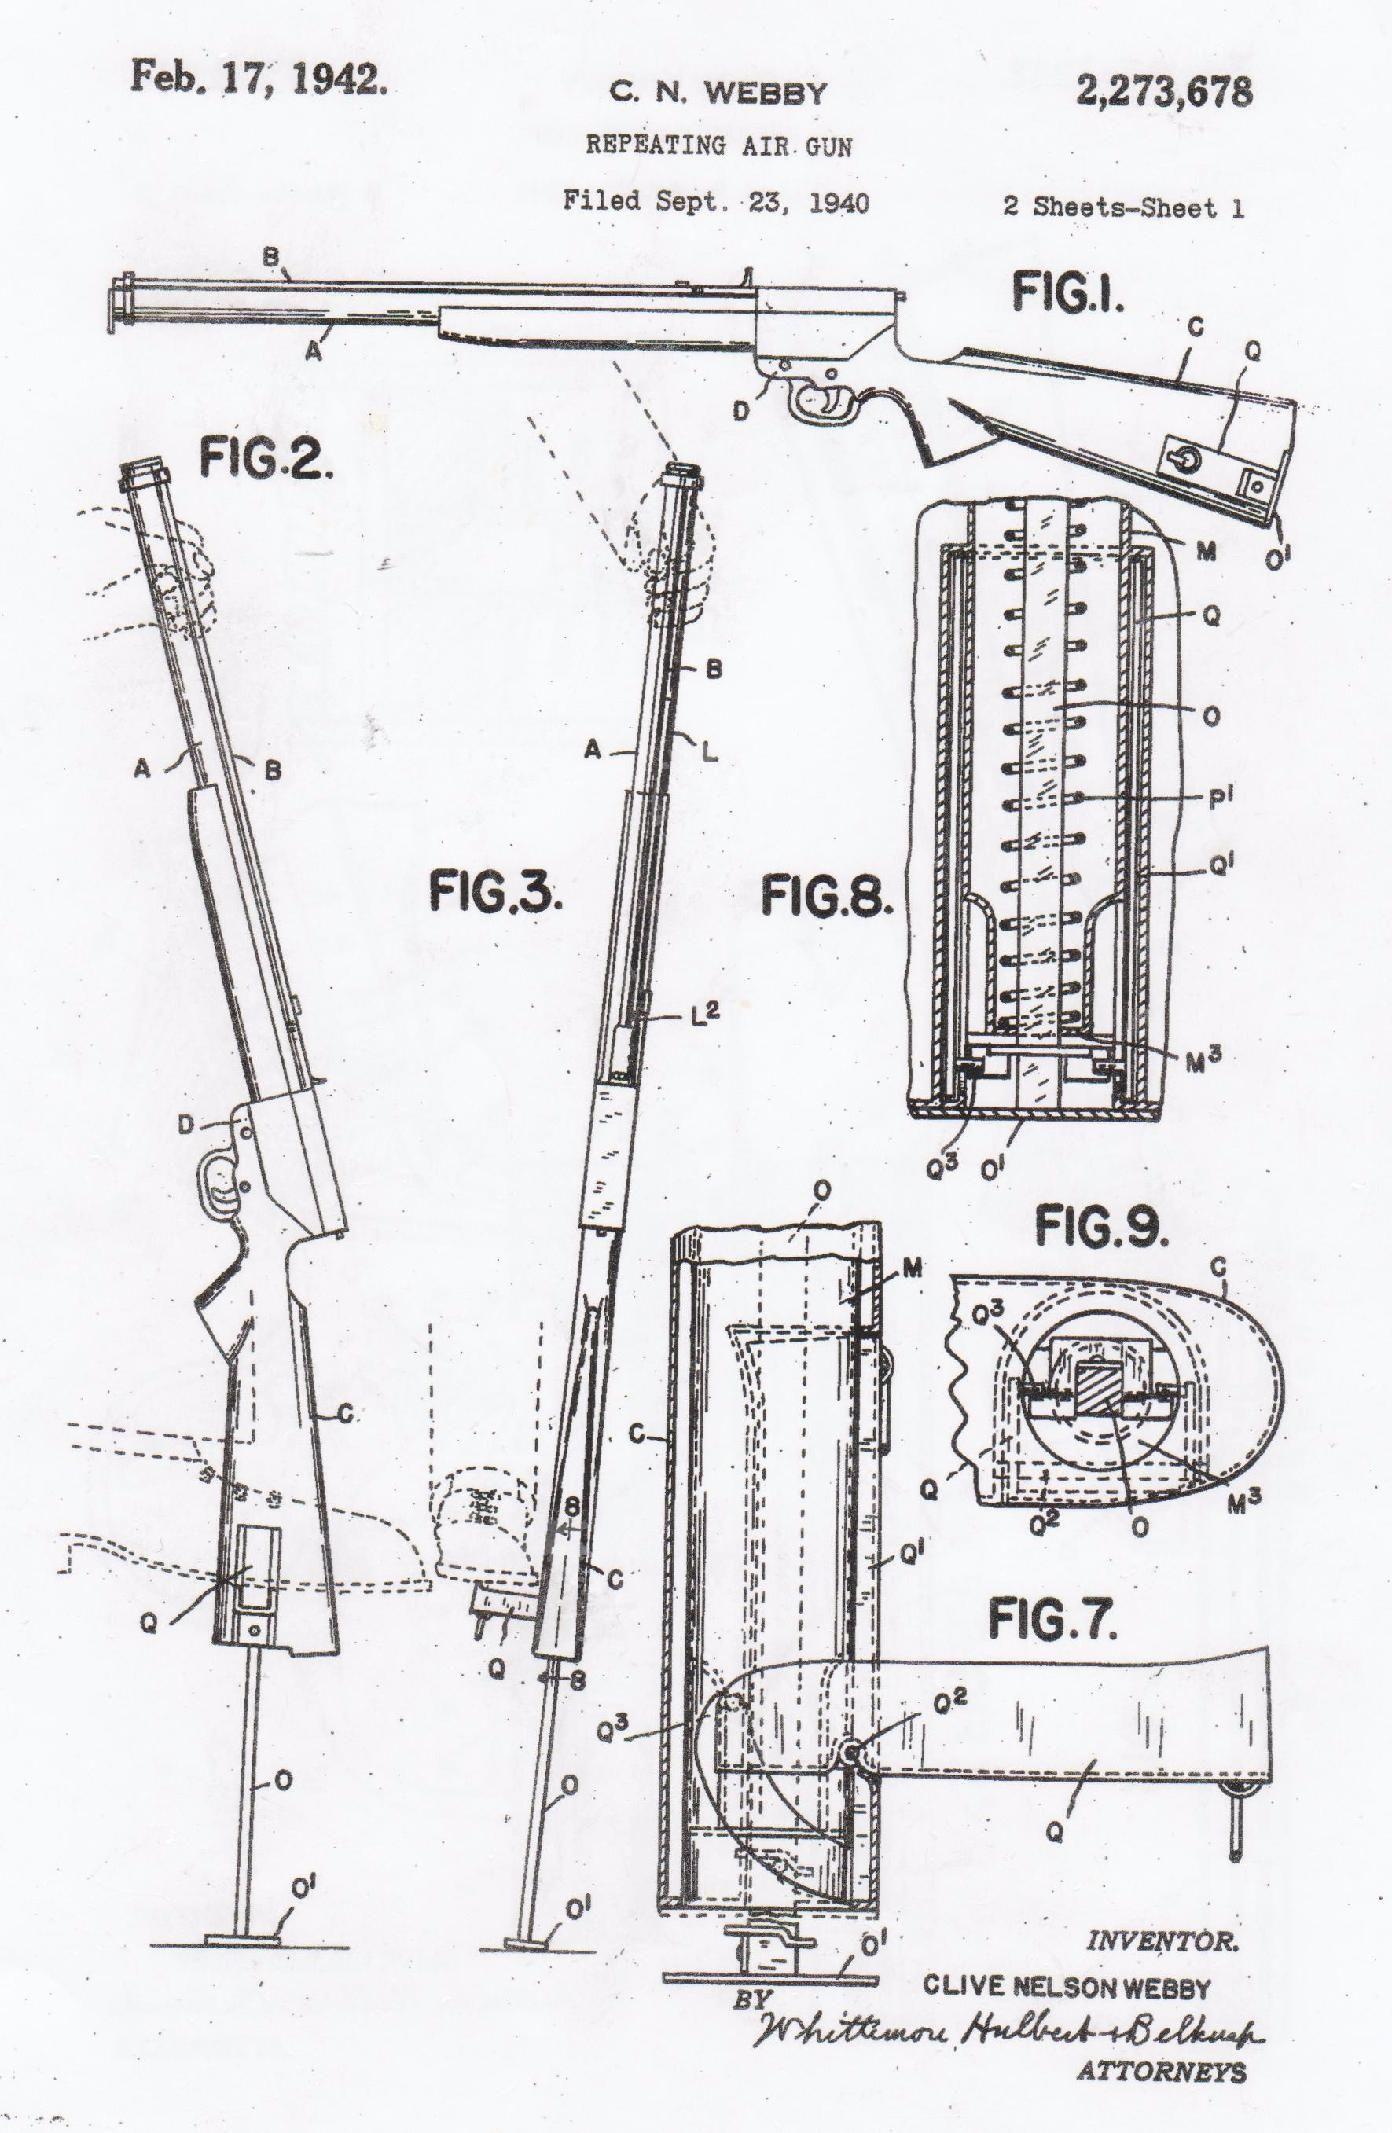 Daisy 1894 Parts Diagram How To Read Wiring Diagrams Automotive Trev 39s Airgun Scrapbook Weby Air Rifle Comprimé